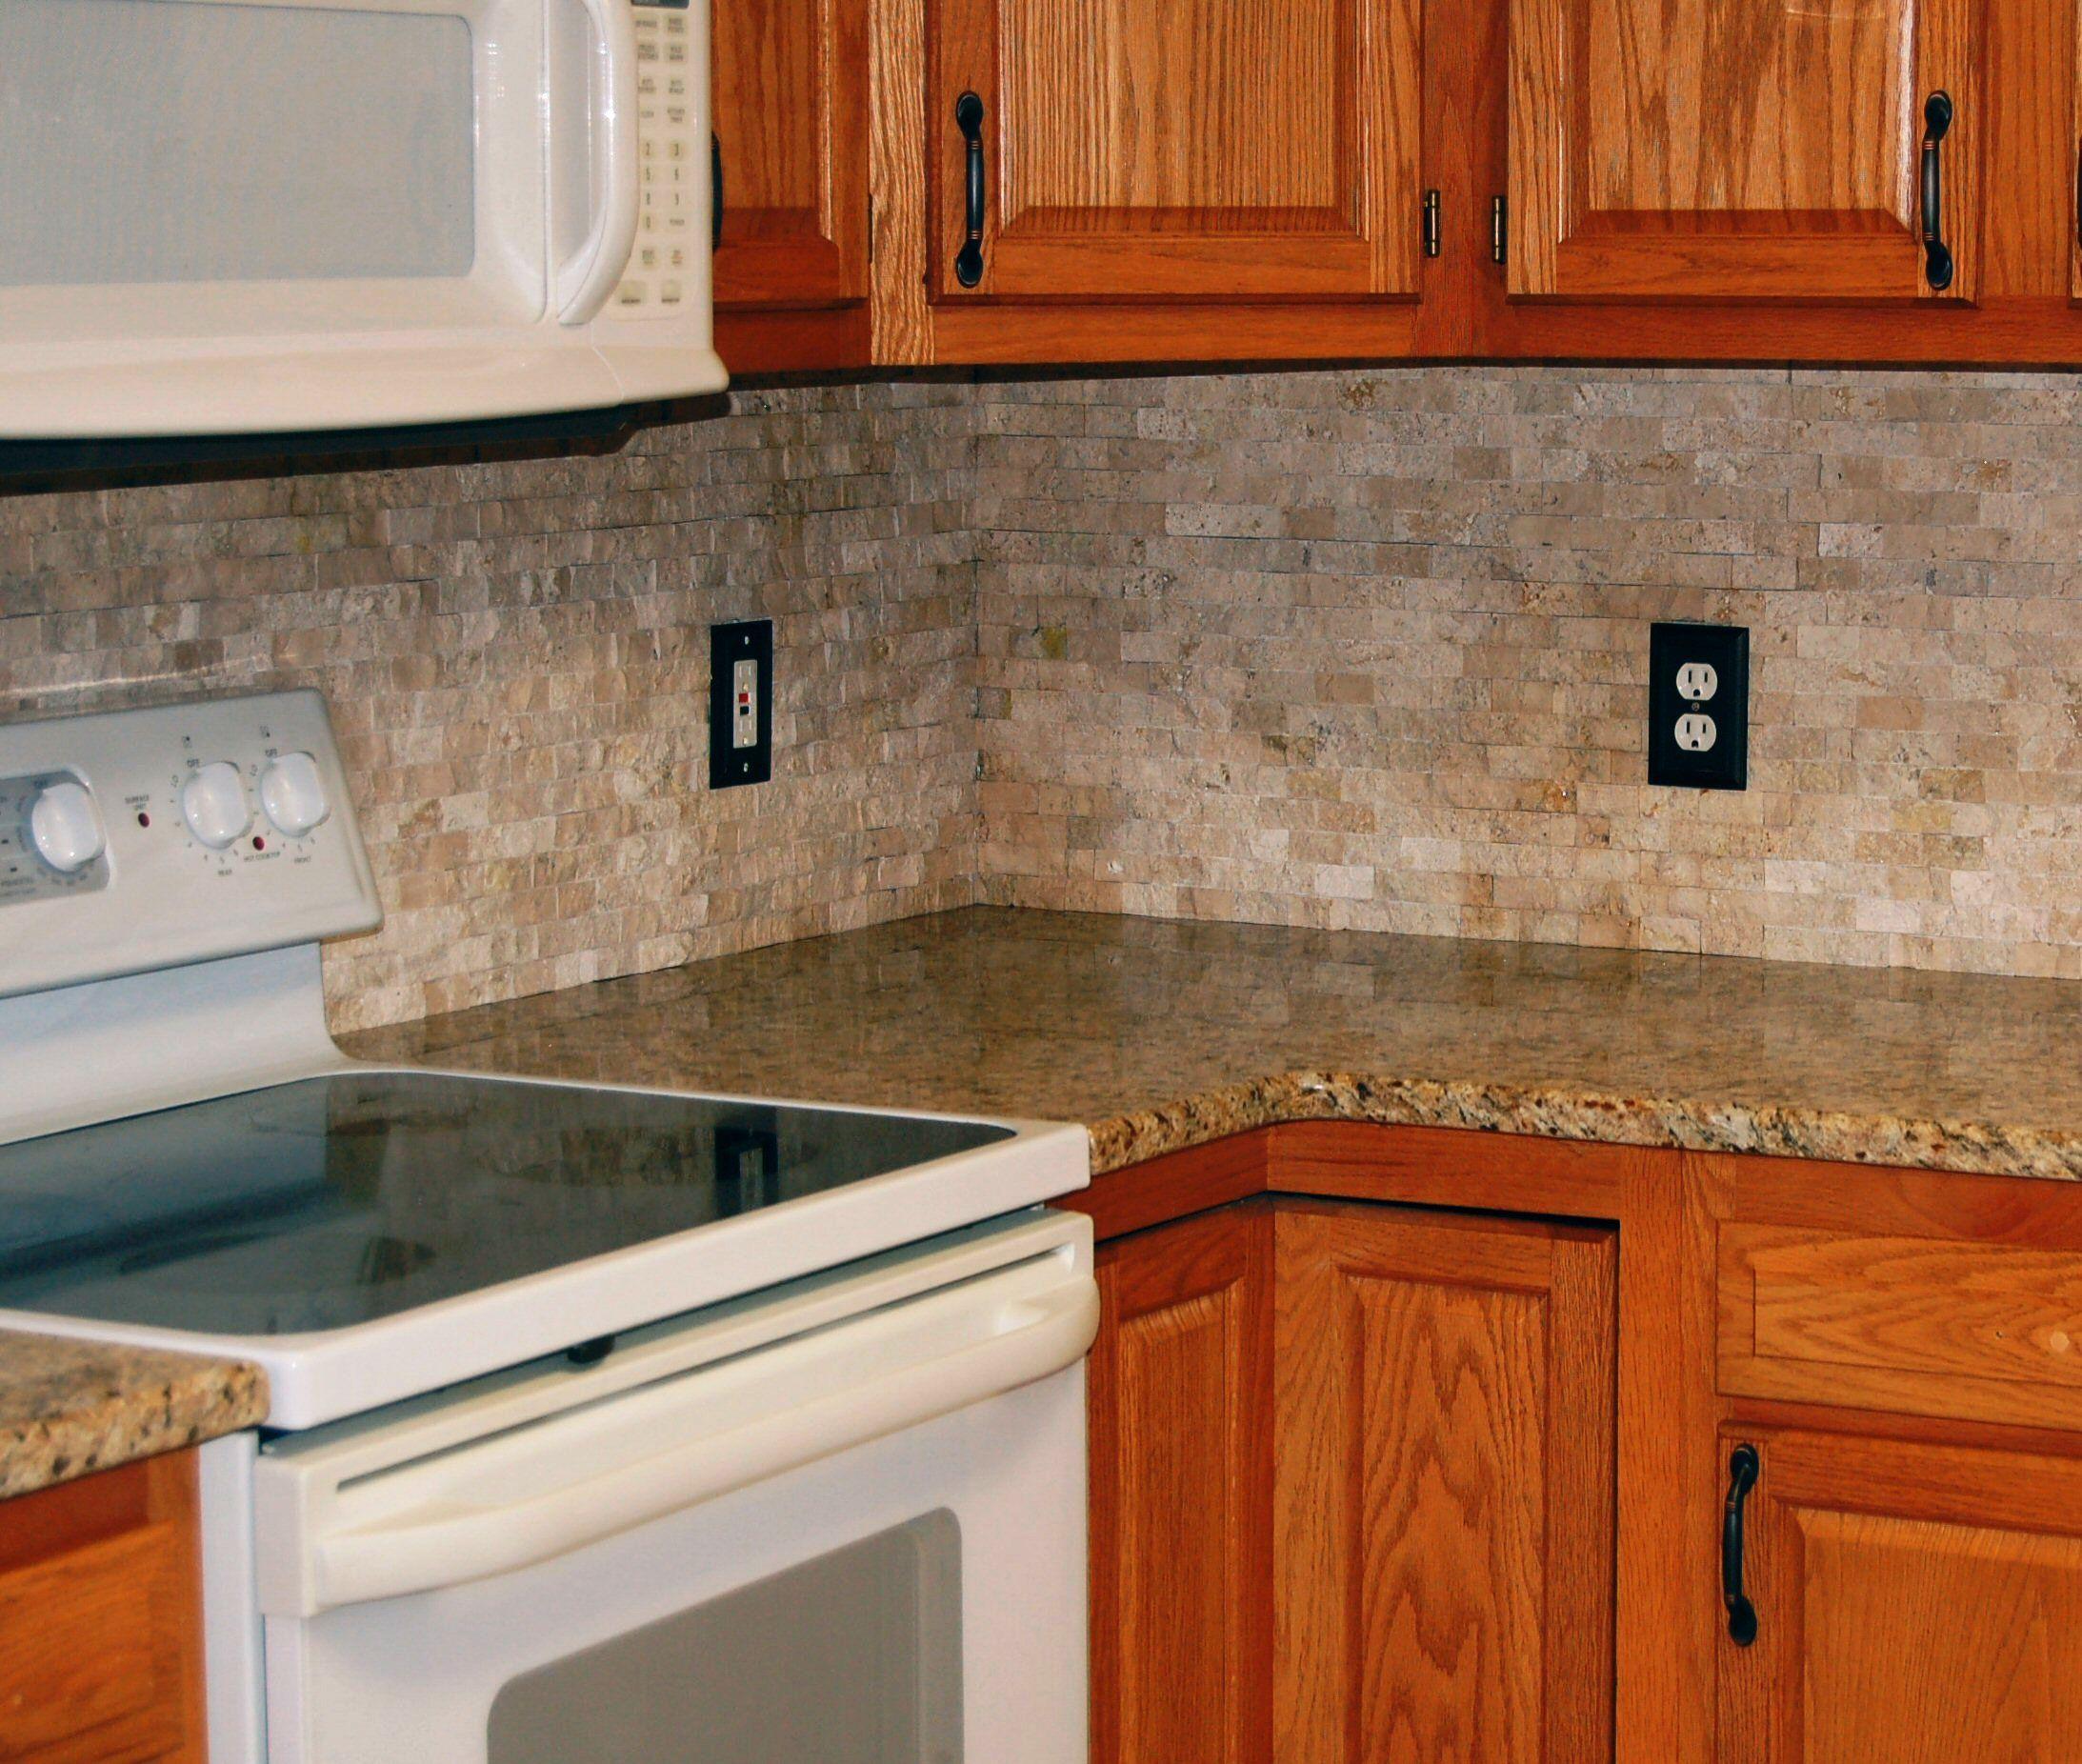 Kitchen Stone Backsplash: STONE-Backsplash Designs For Your Kitchen And Bathroom